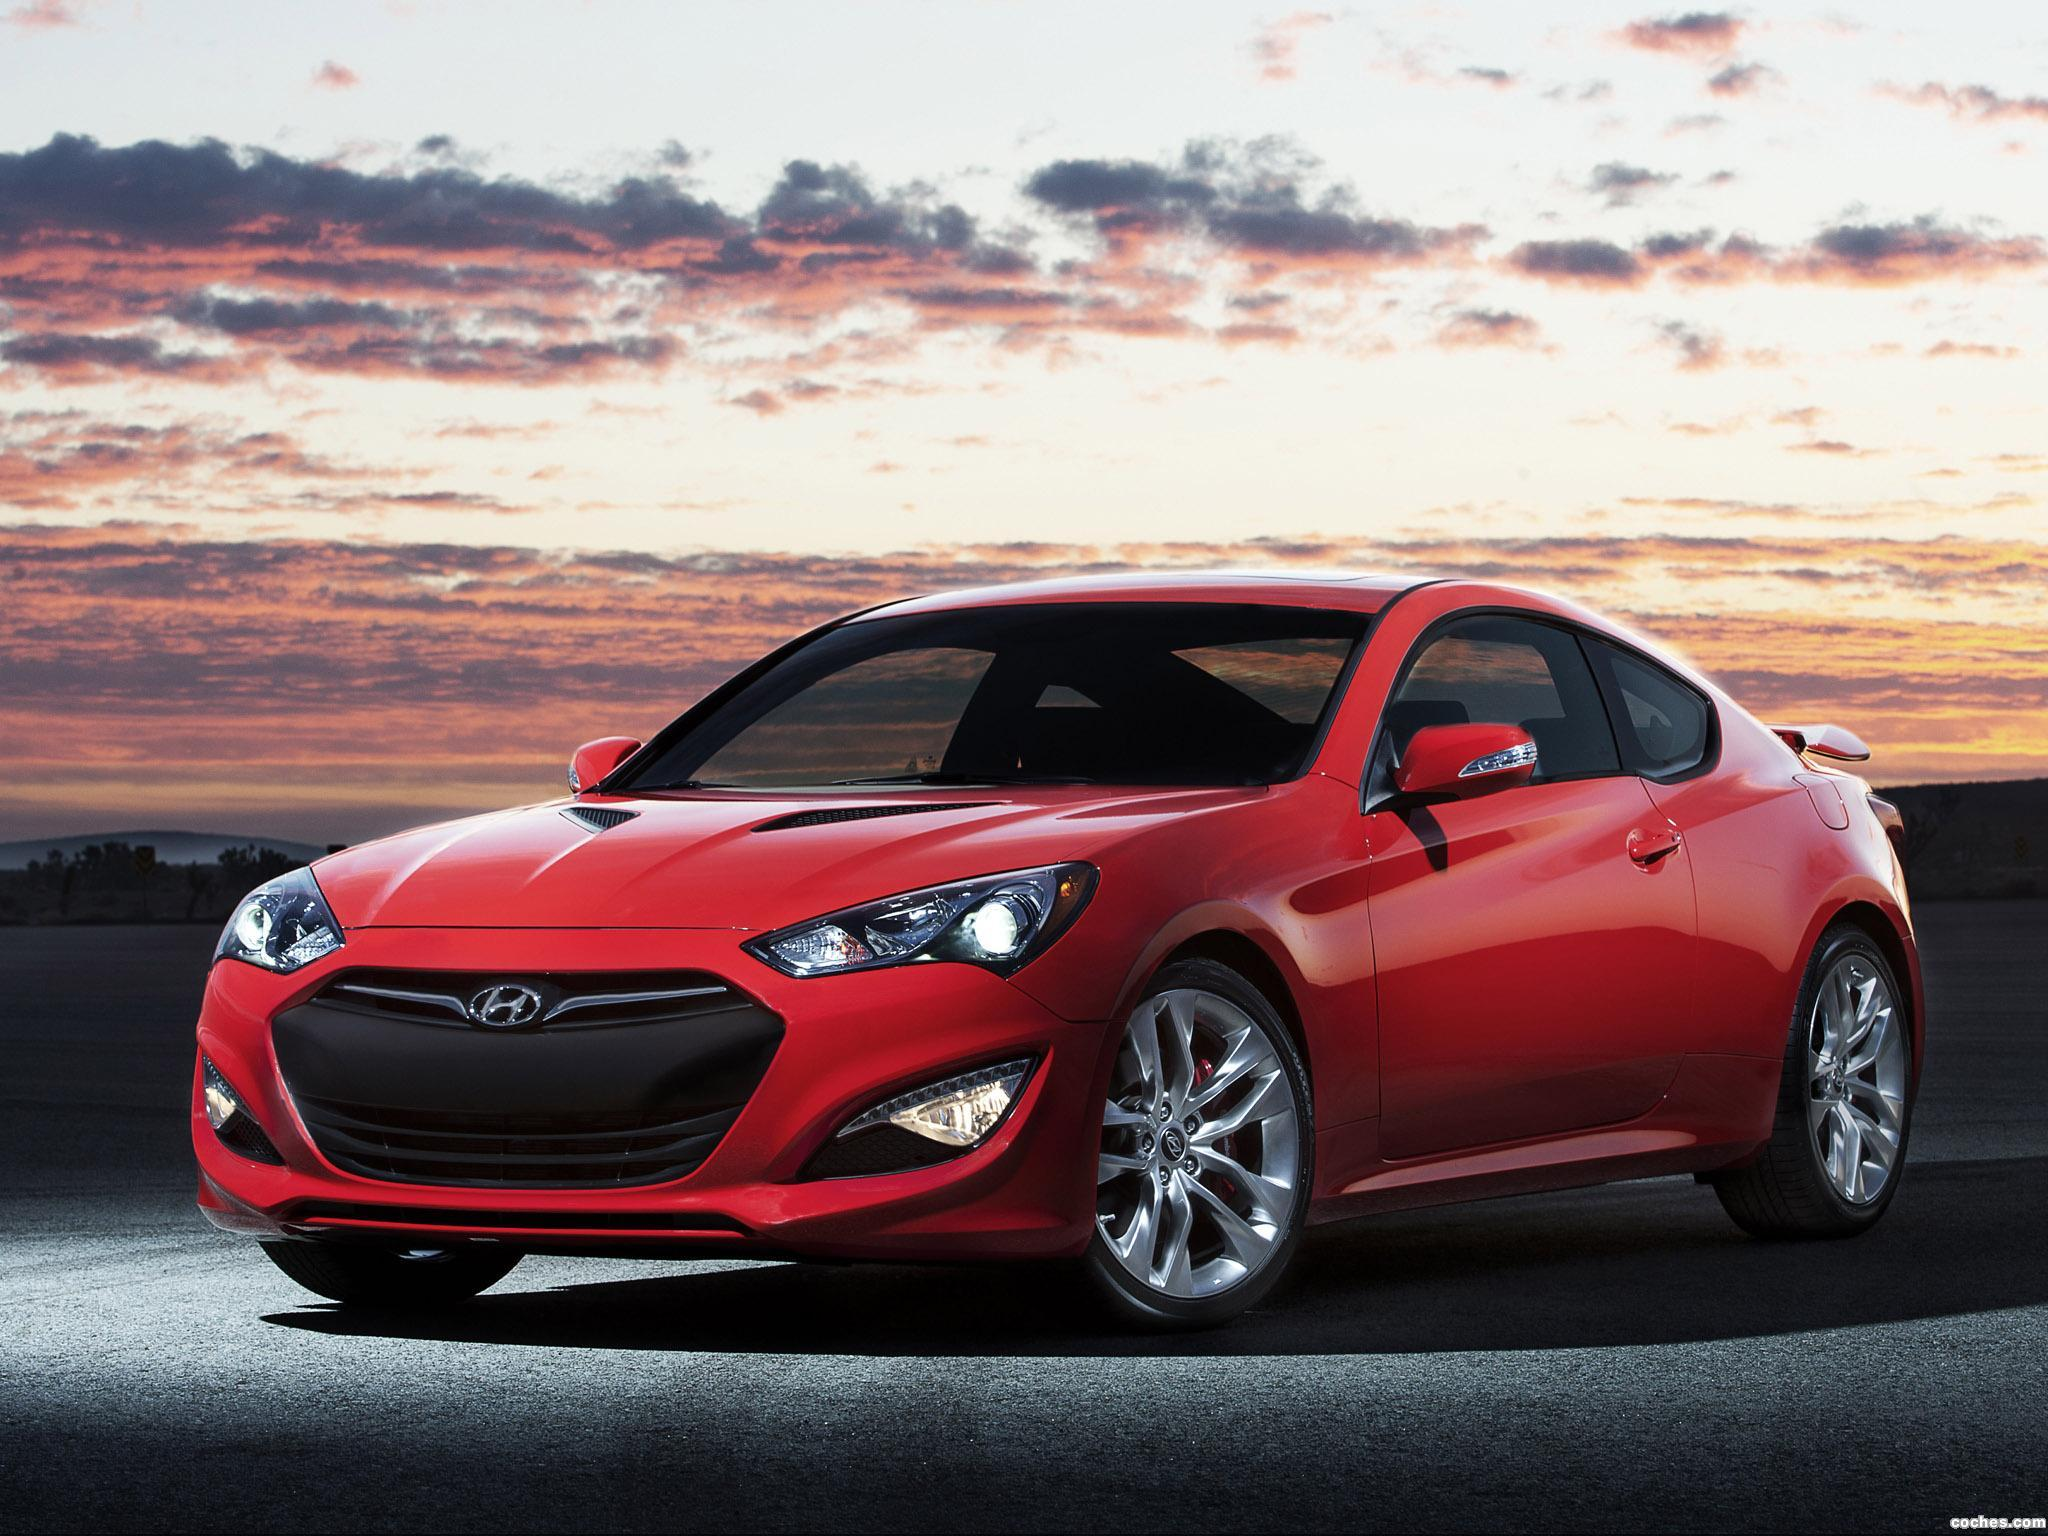 Foto 0 de Hyundai Genesis Coupe 2012